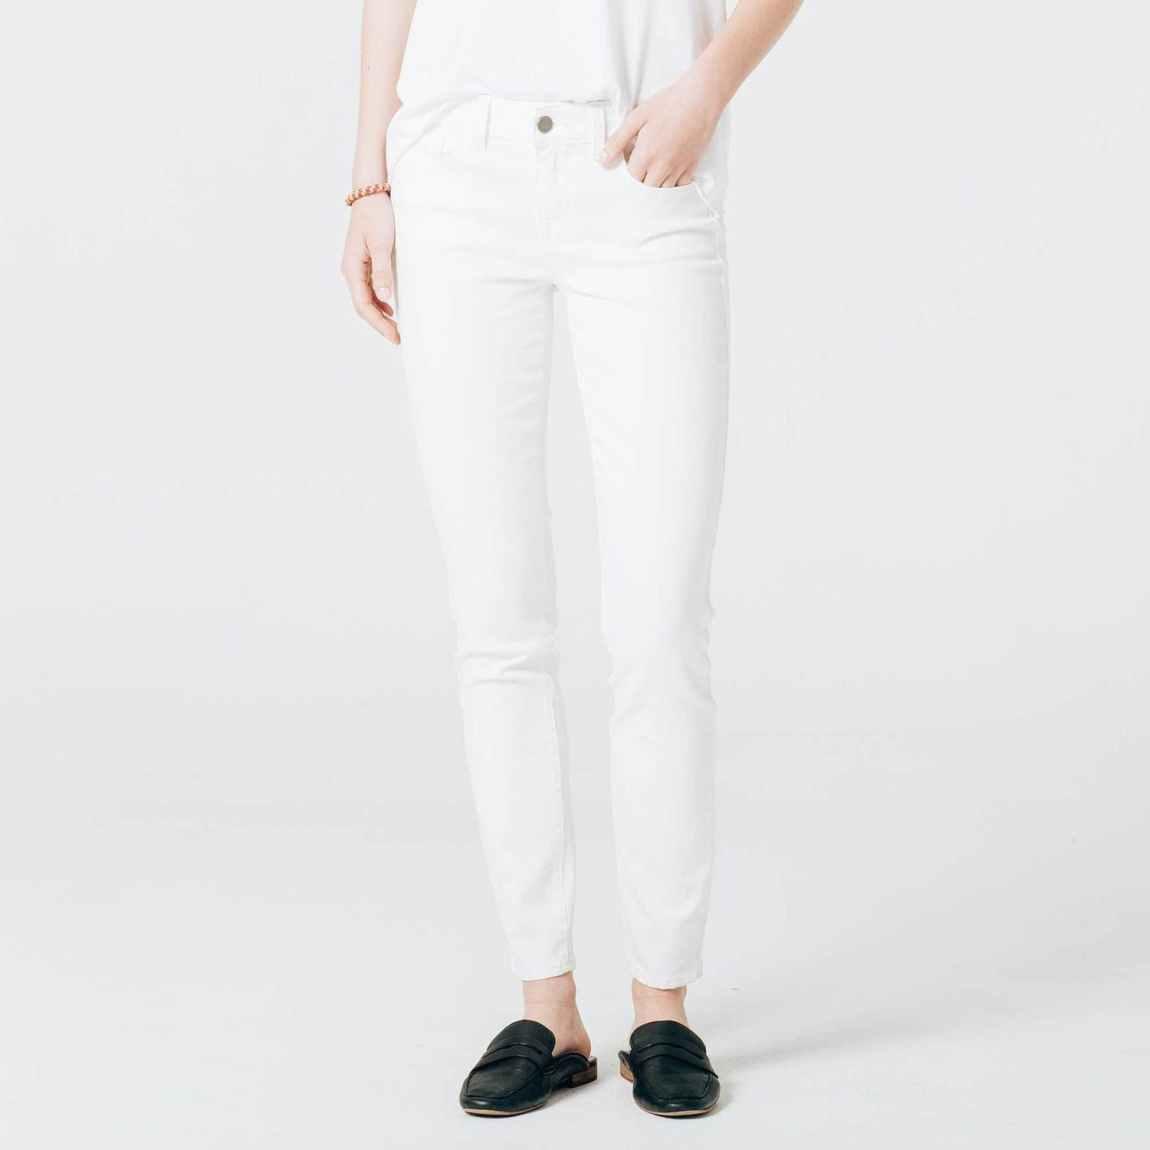 dstld jeans, dstld, white skinny jeans, skinny jeans, mid rise jeans, stretch denim